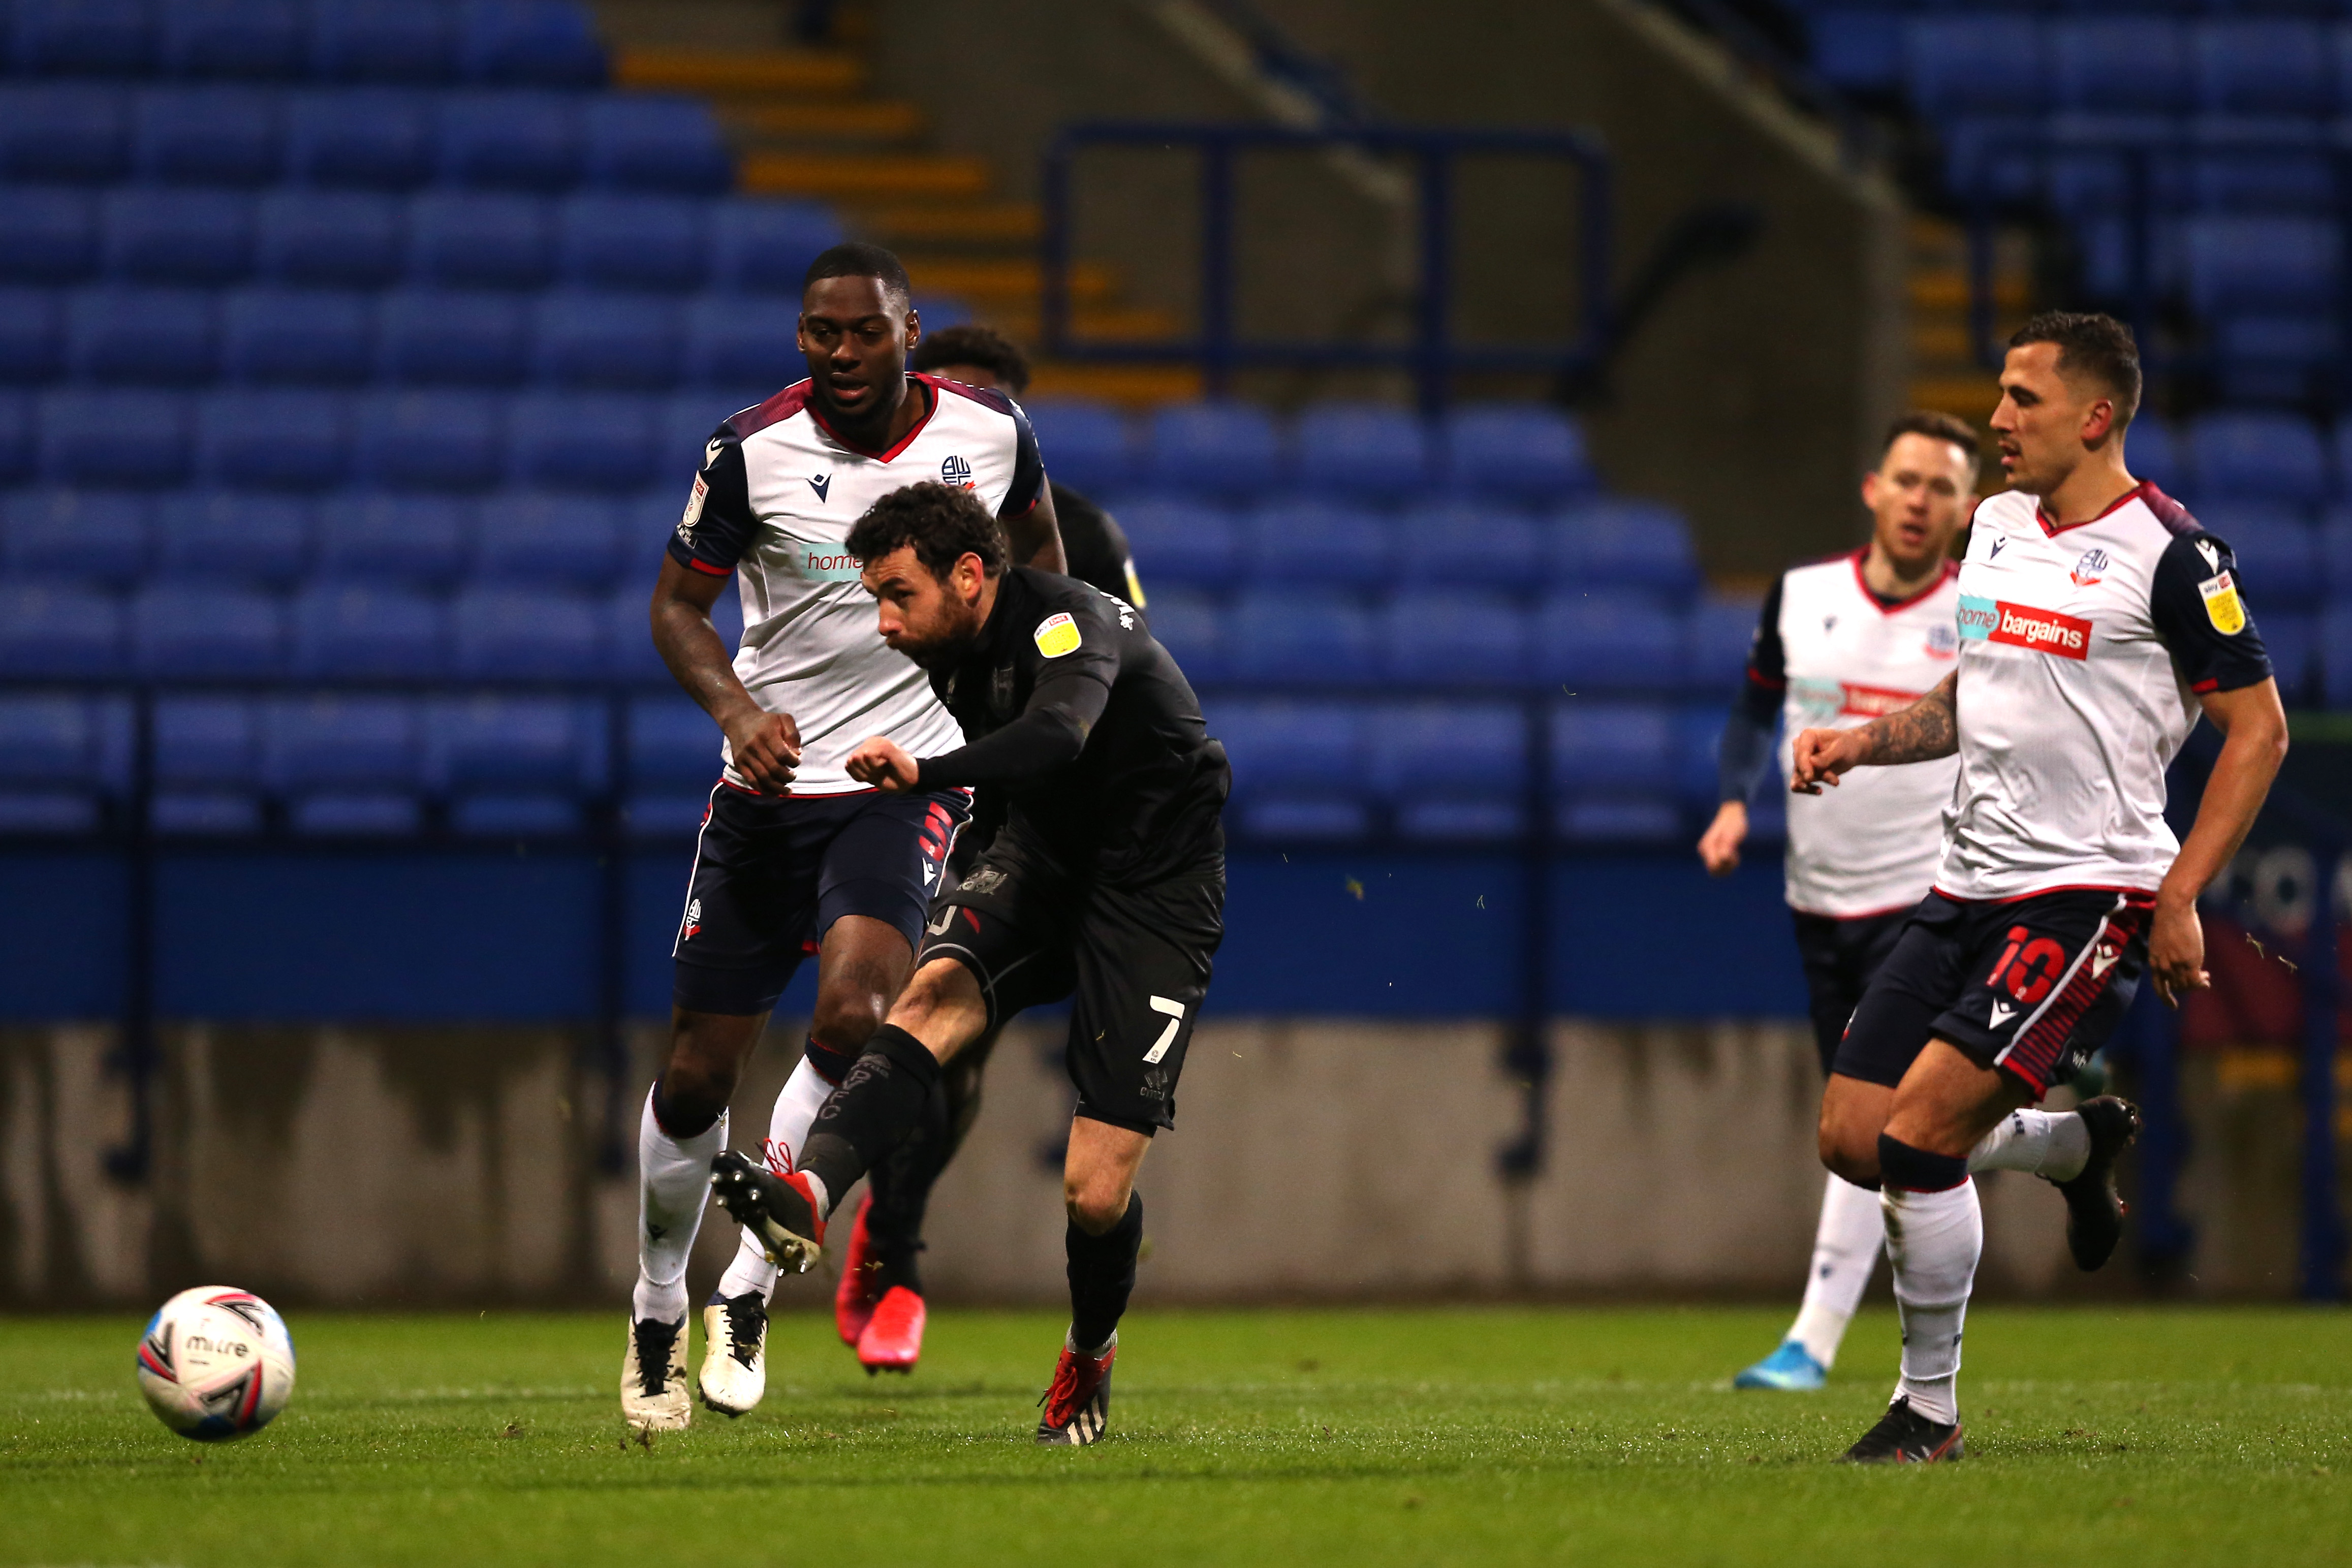 Bolton Wanderers v Port Vale - Sky Bet League Two